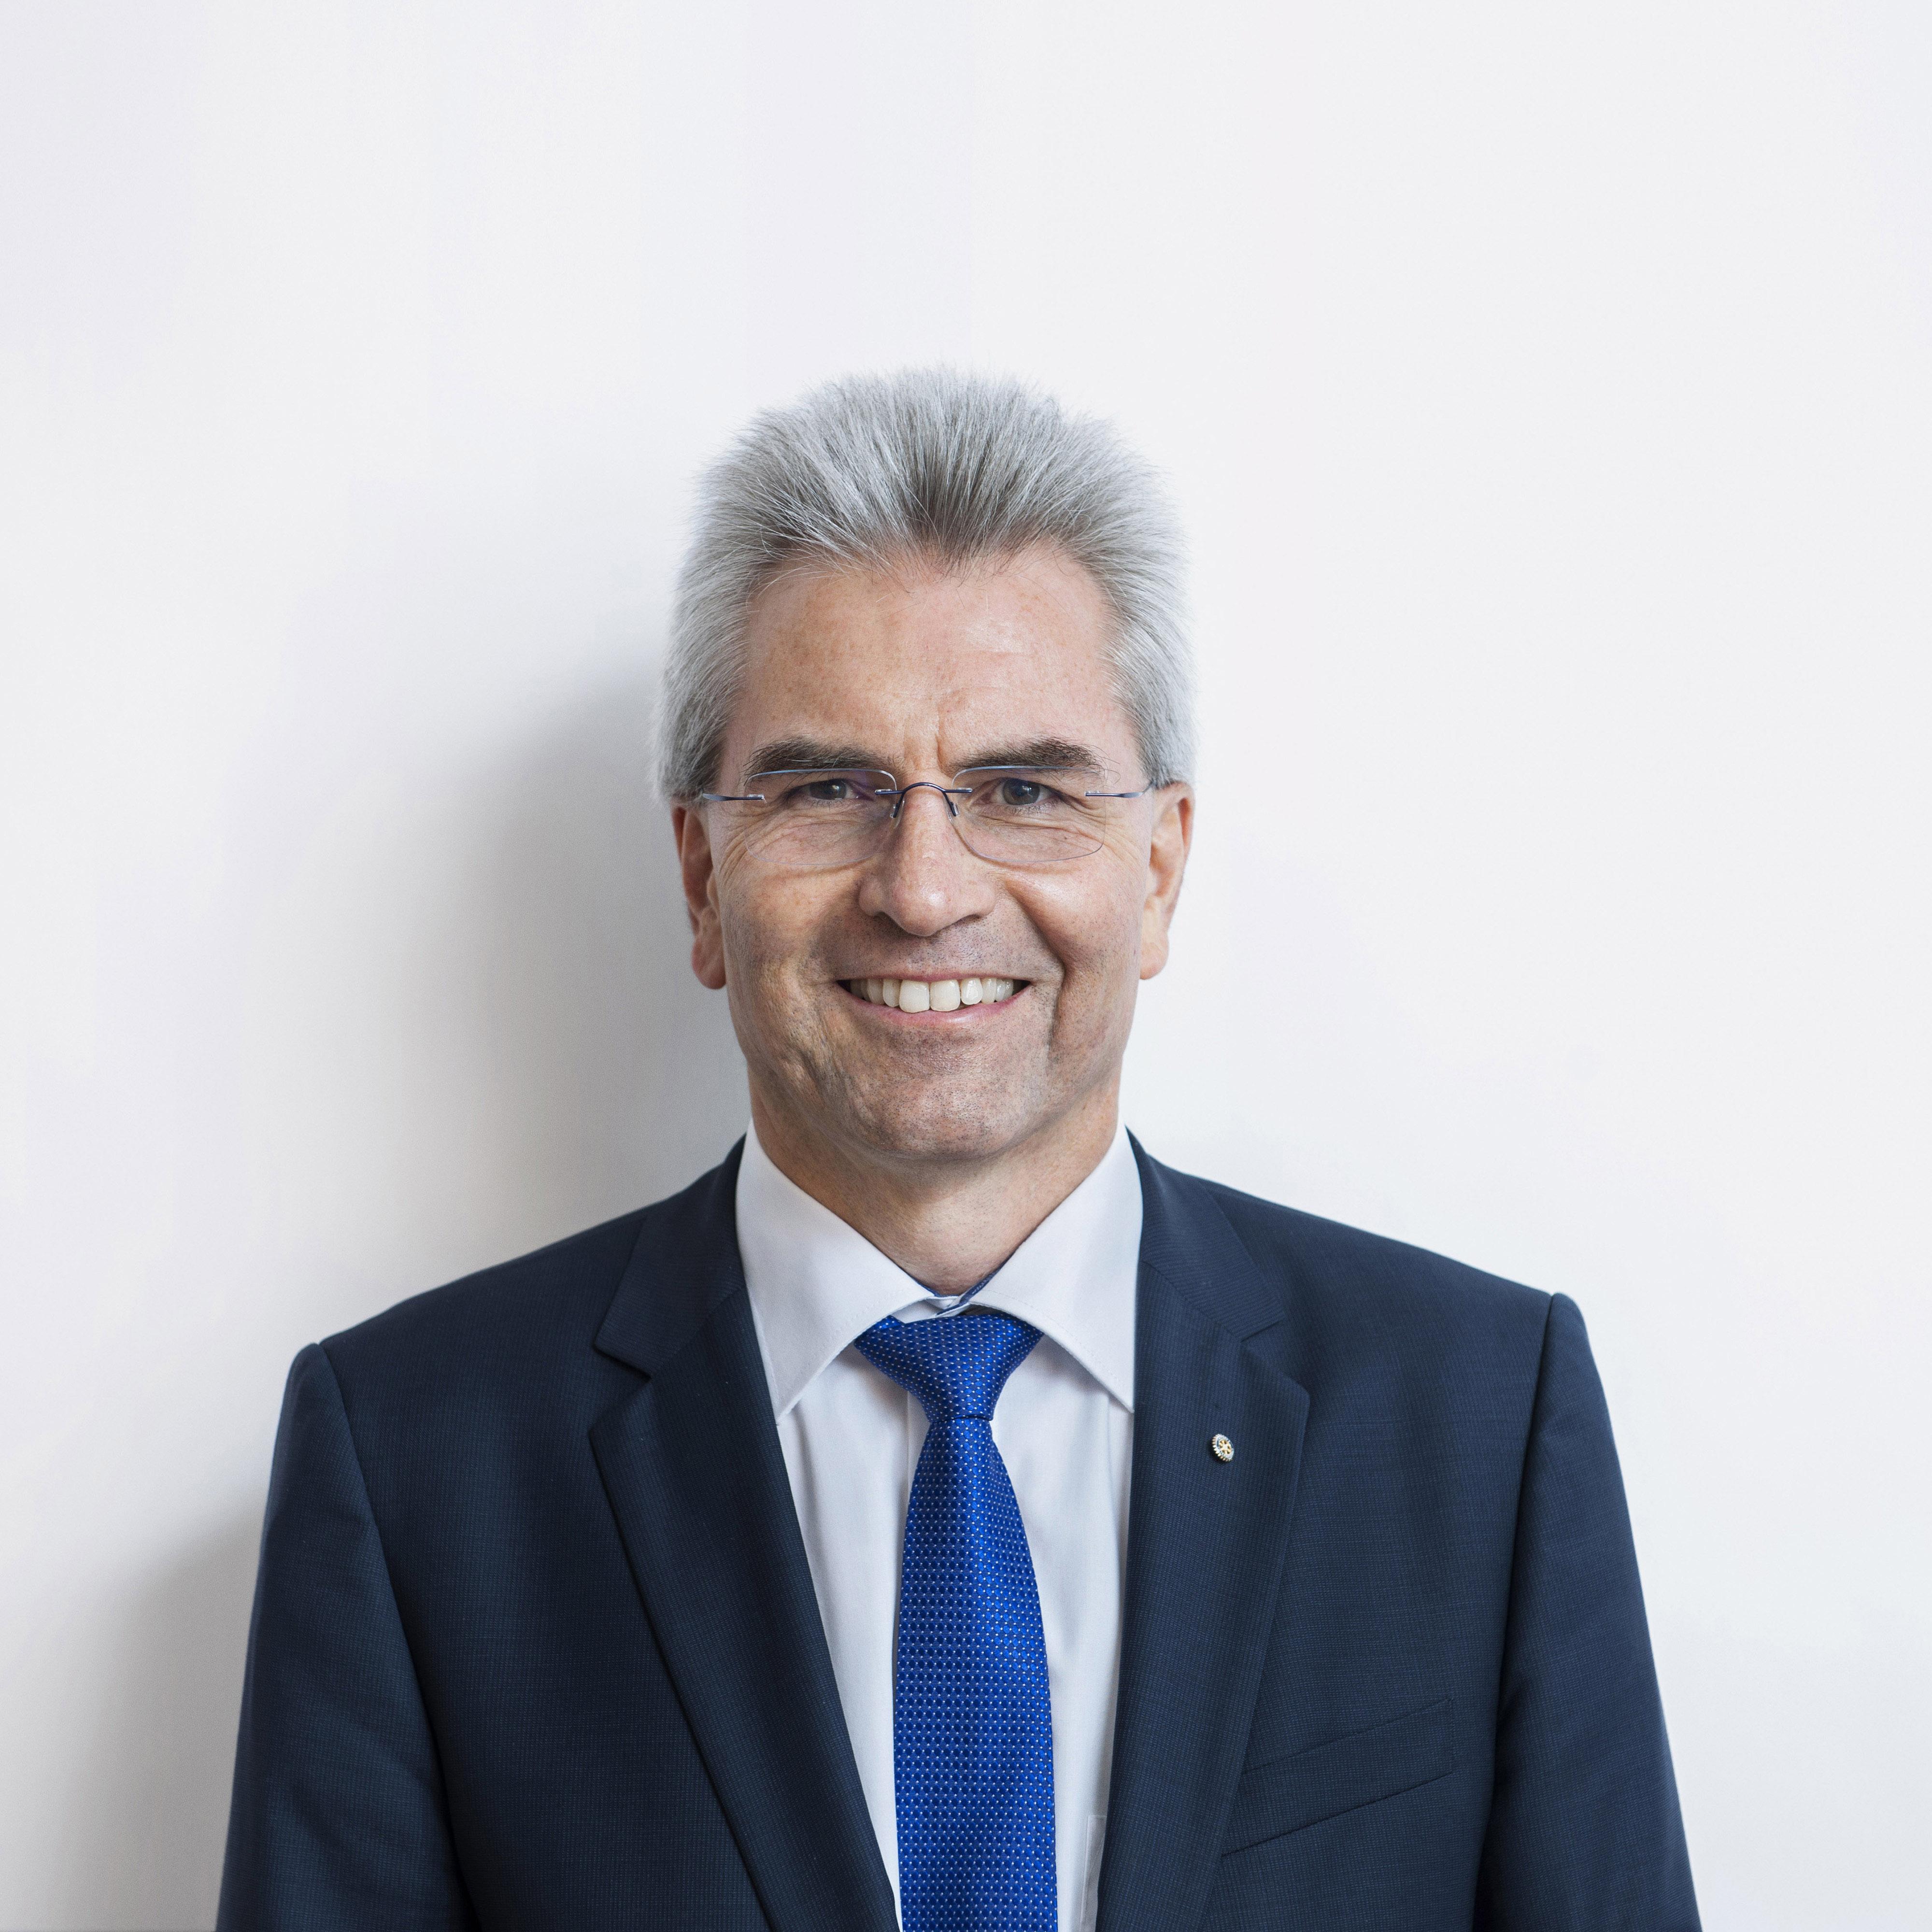 Dr. Hans-Peter Hubmann